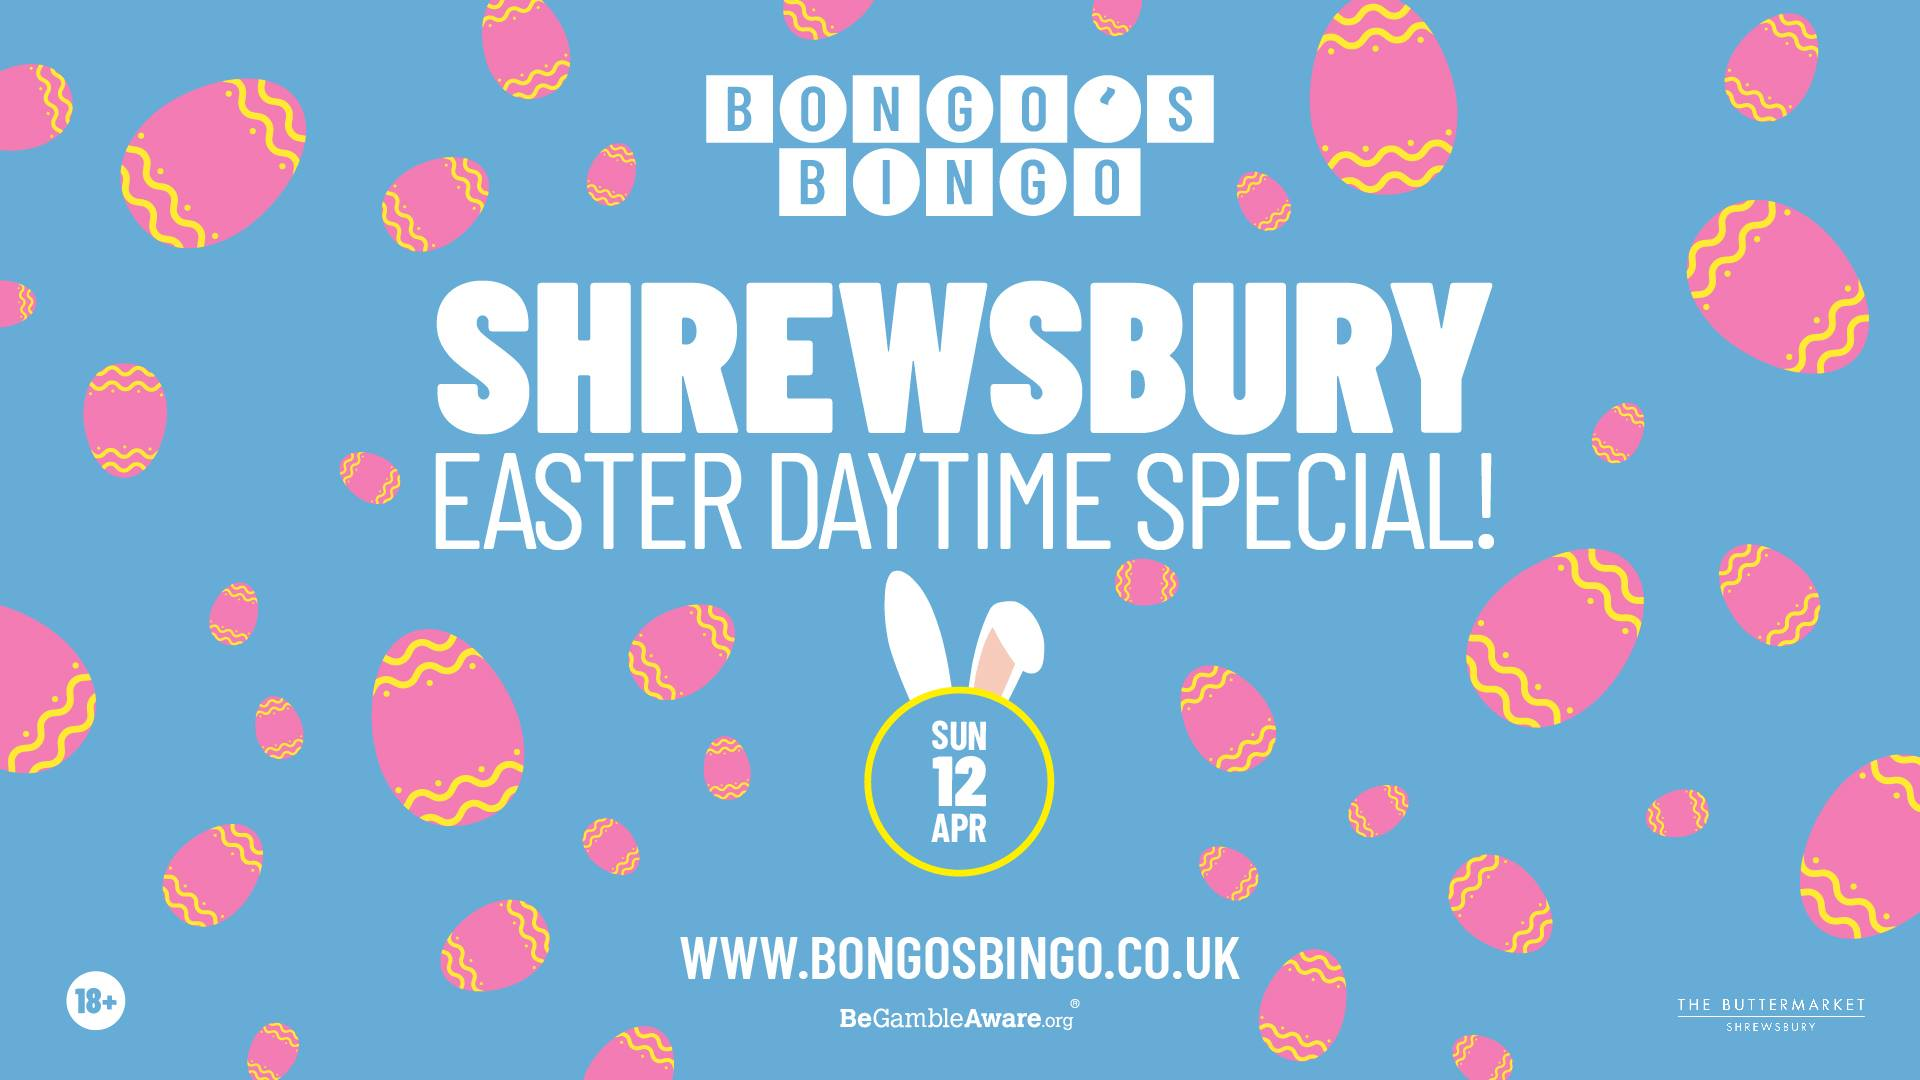 Bongo's Bingo Easter Daytime Special – POSTPONED